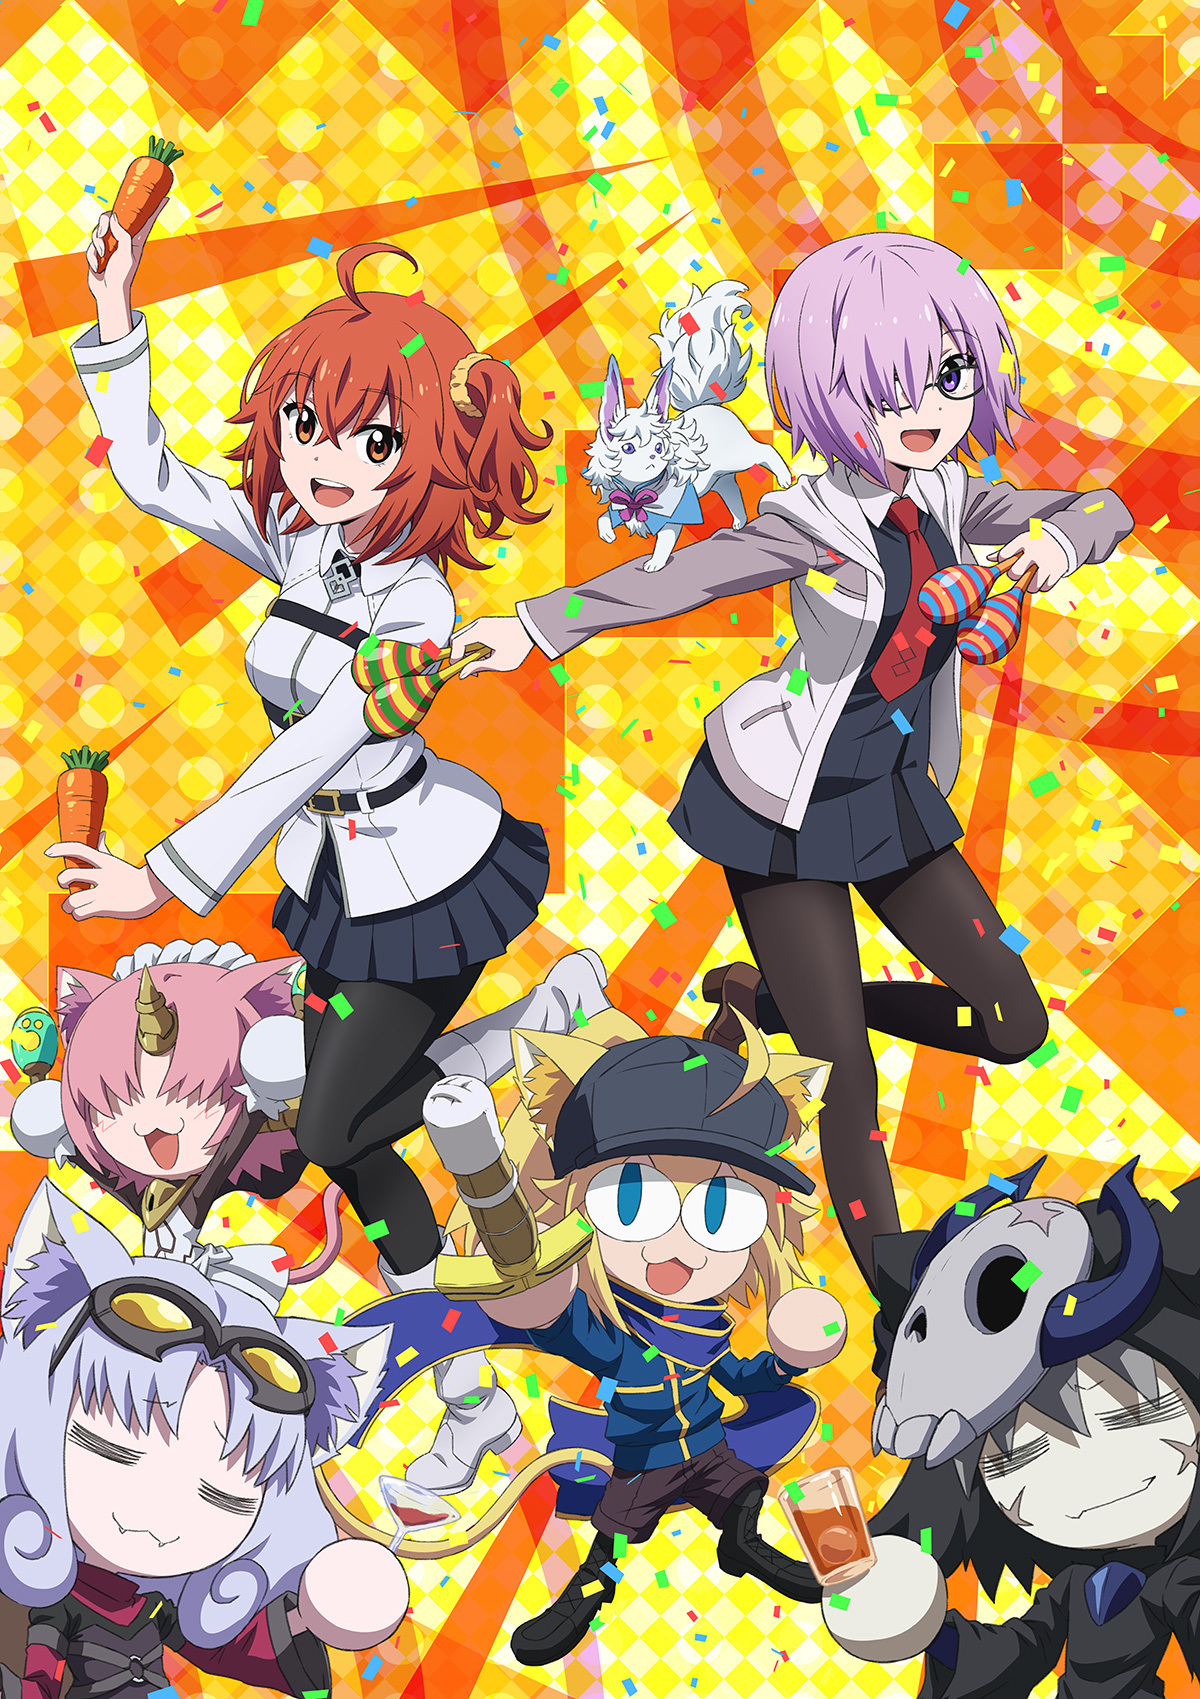 【情报】OVA动画《Fate/Grand Carnival》PV&视觉图公开